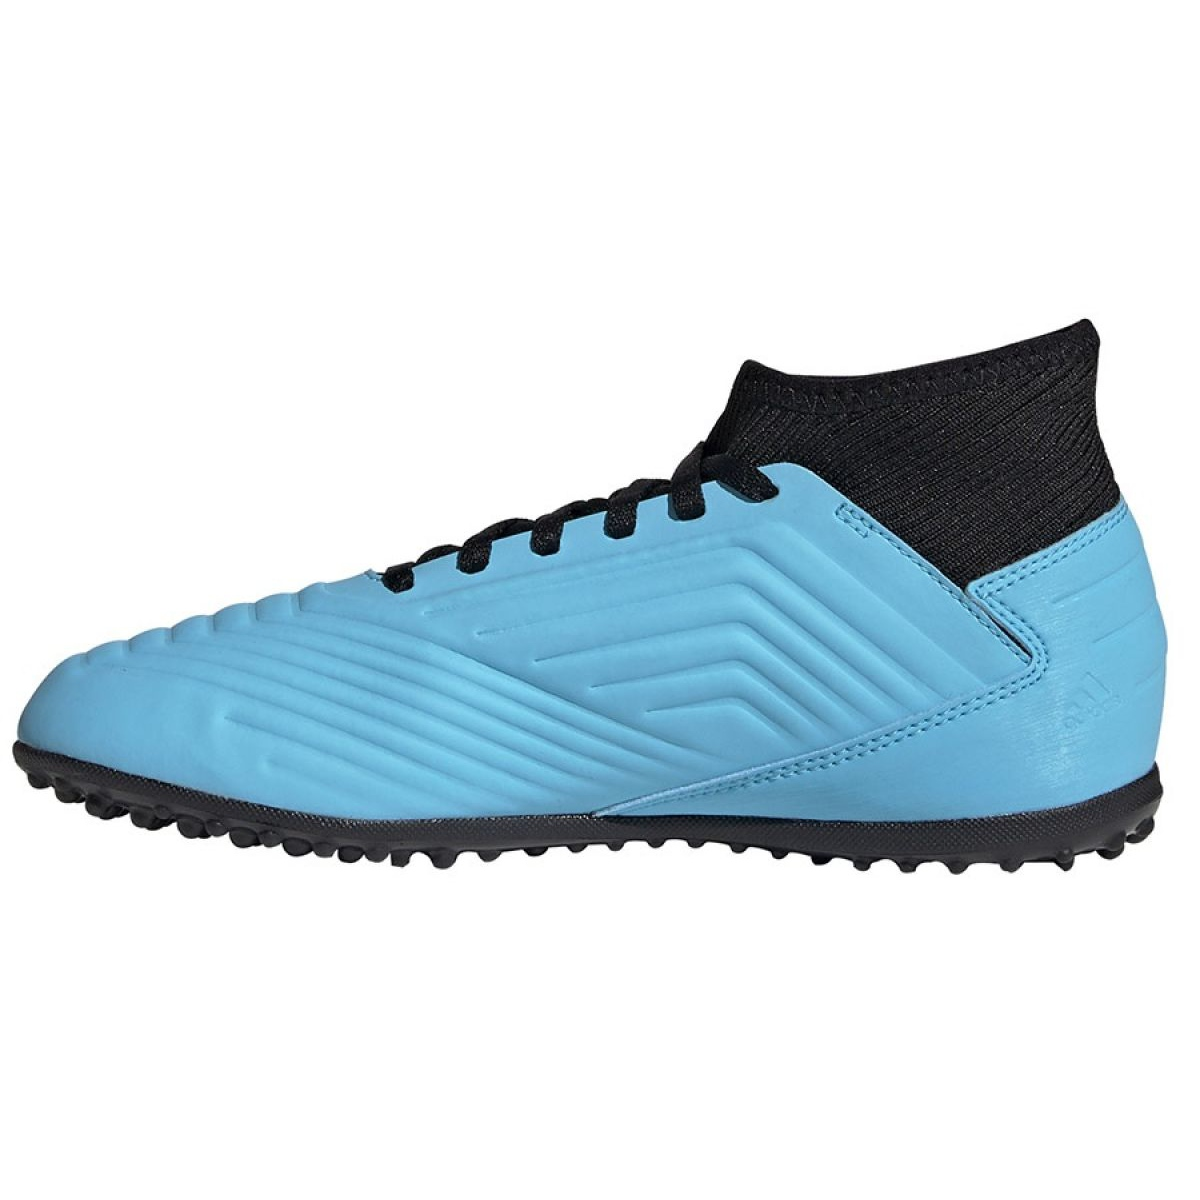 Chuteiras de futebol adidas Predator 19.3 Tf Jr G25803 azul azul